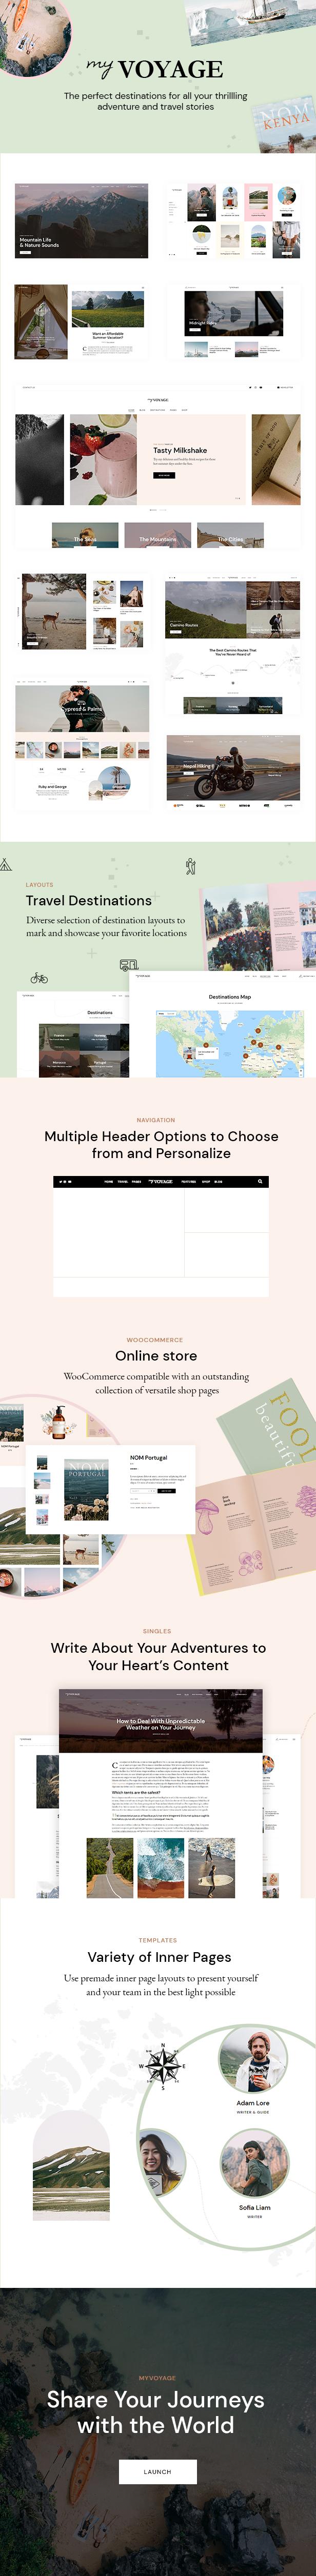 MyVoyage - Travel Blog WordPress Theme - 3